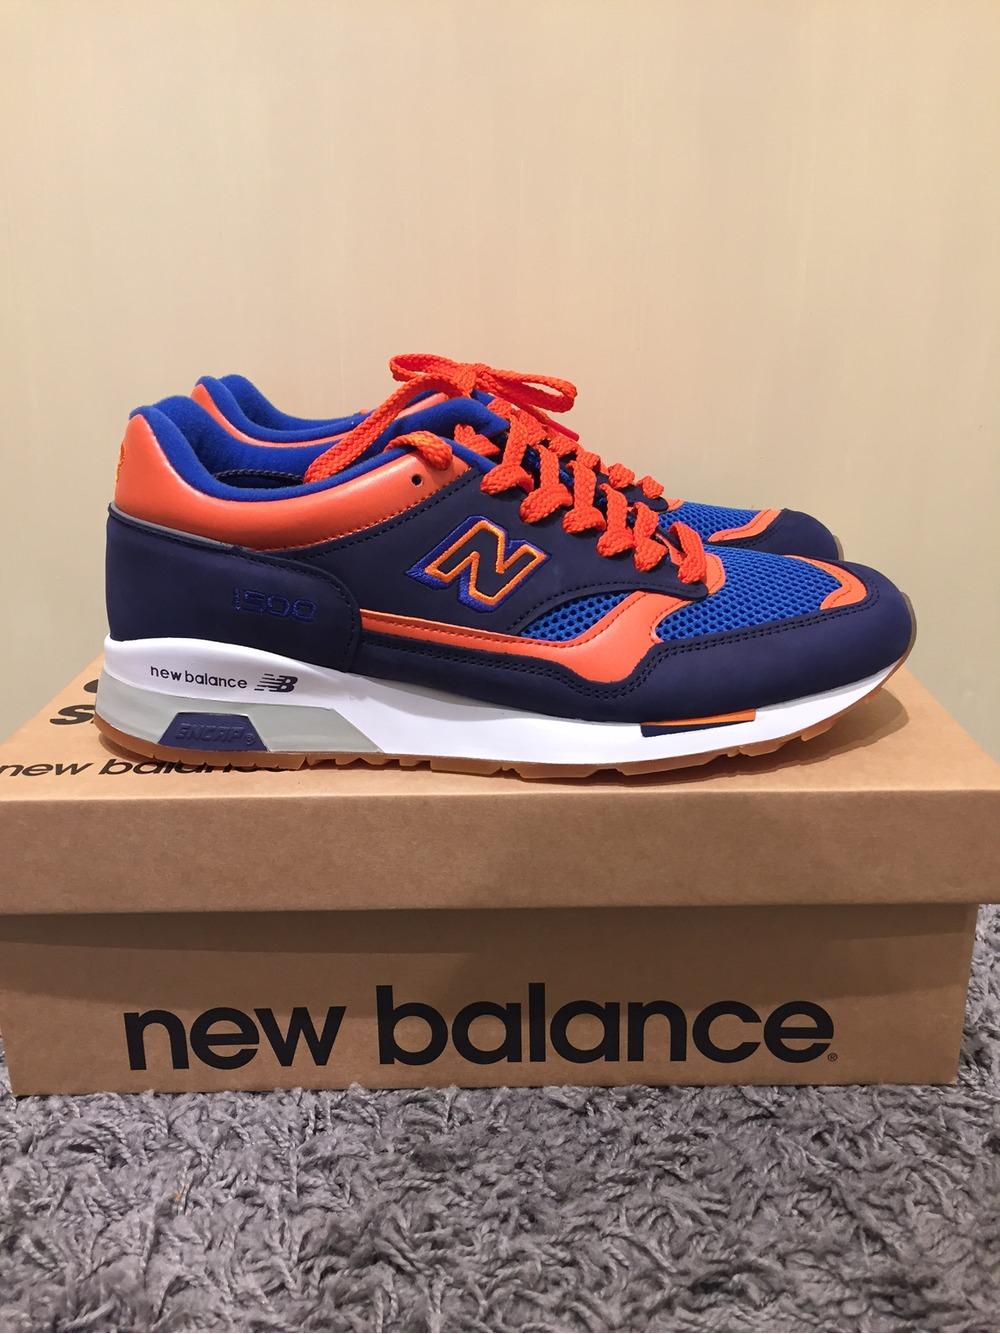 new balance 1500 nbo